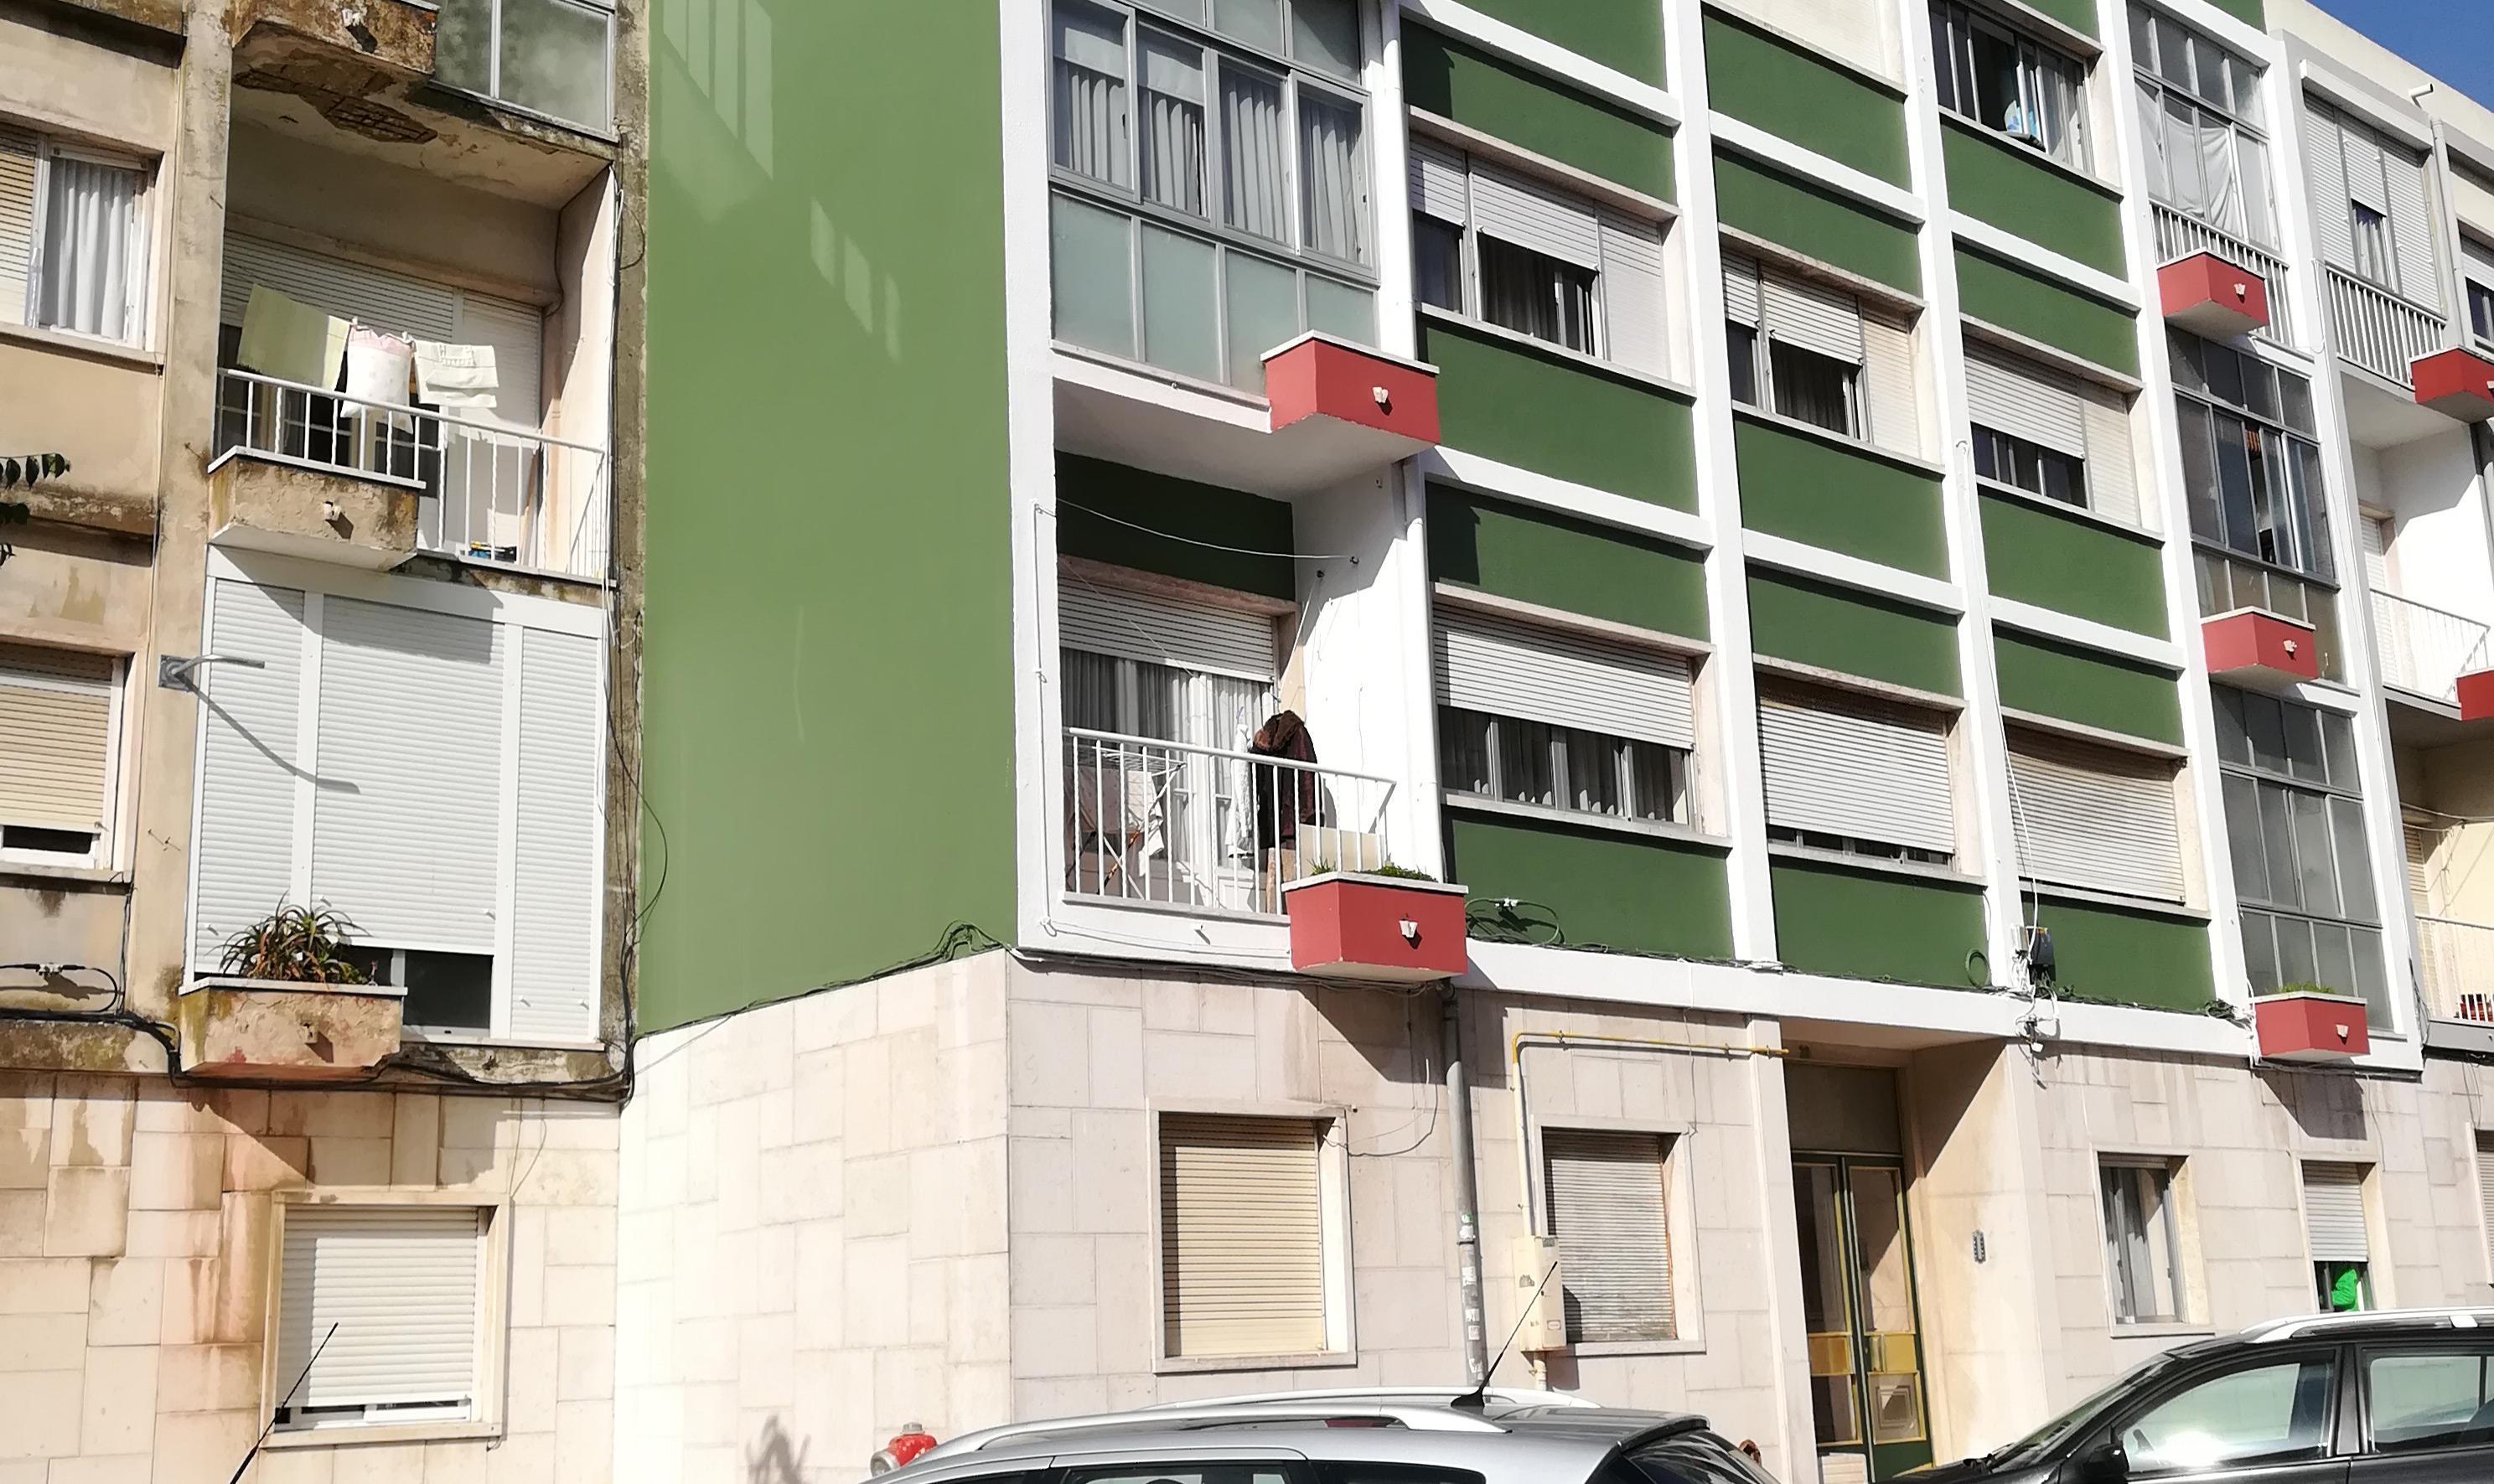 Pintura exterior dos prédios